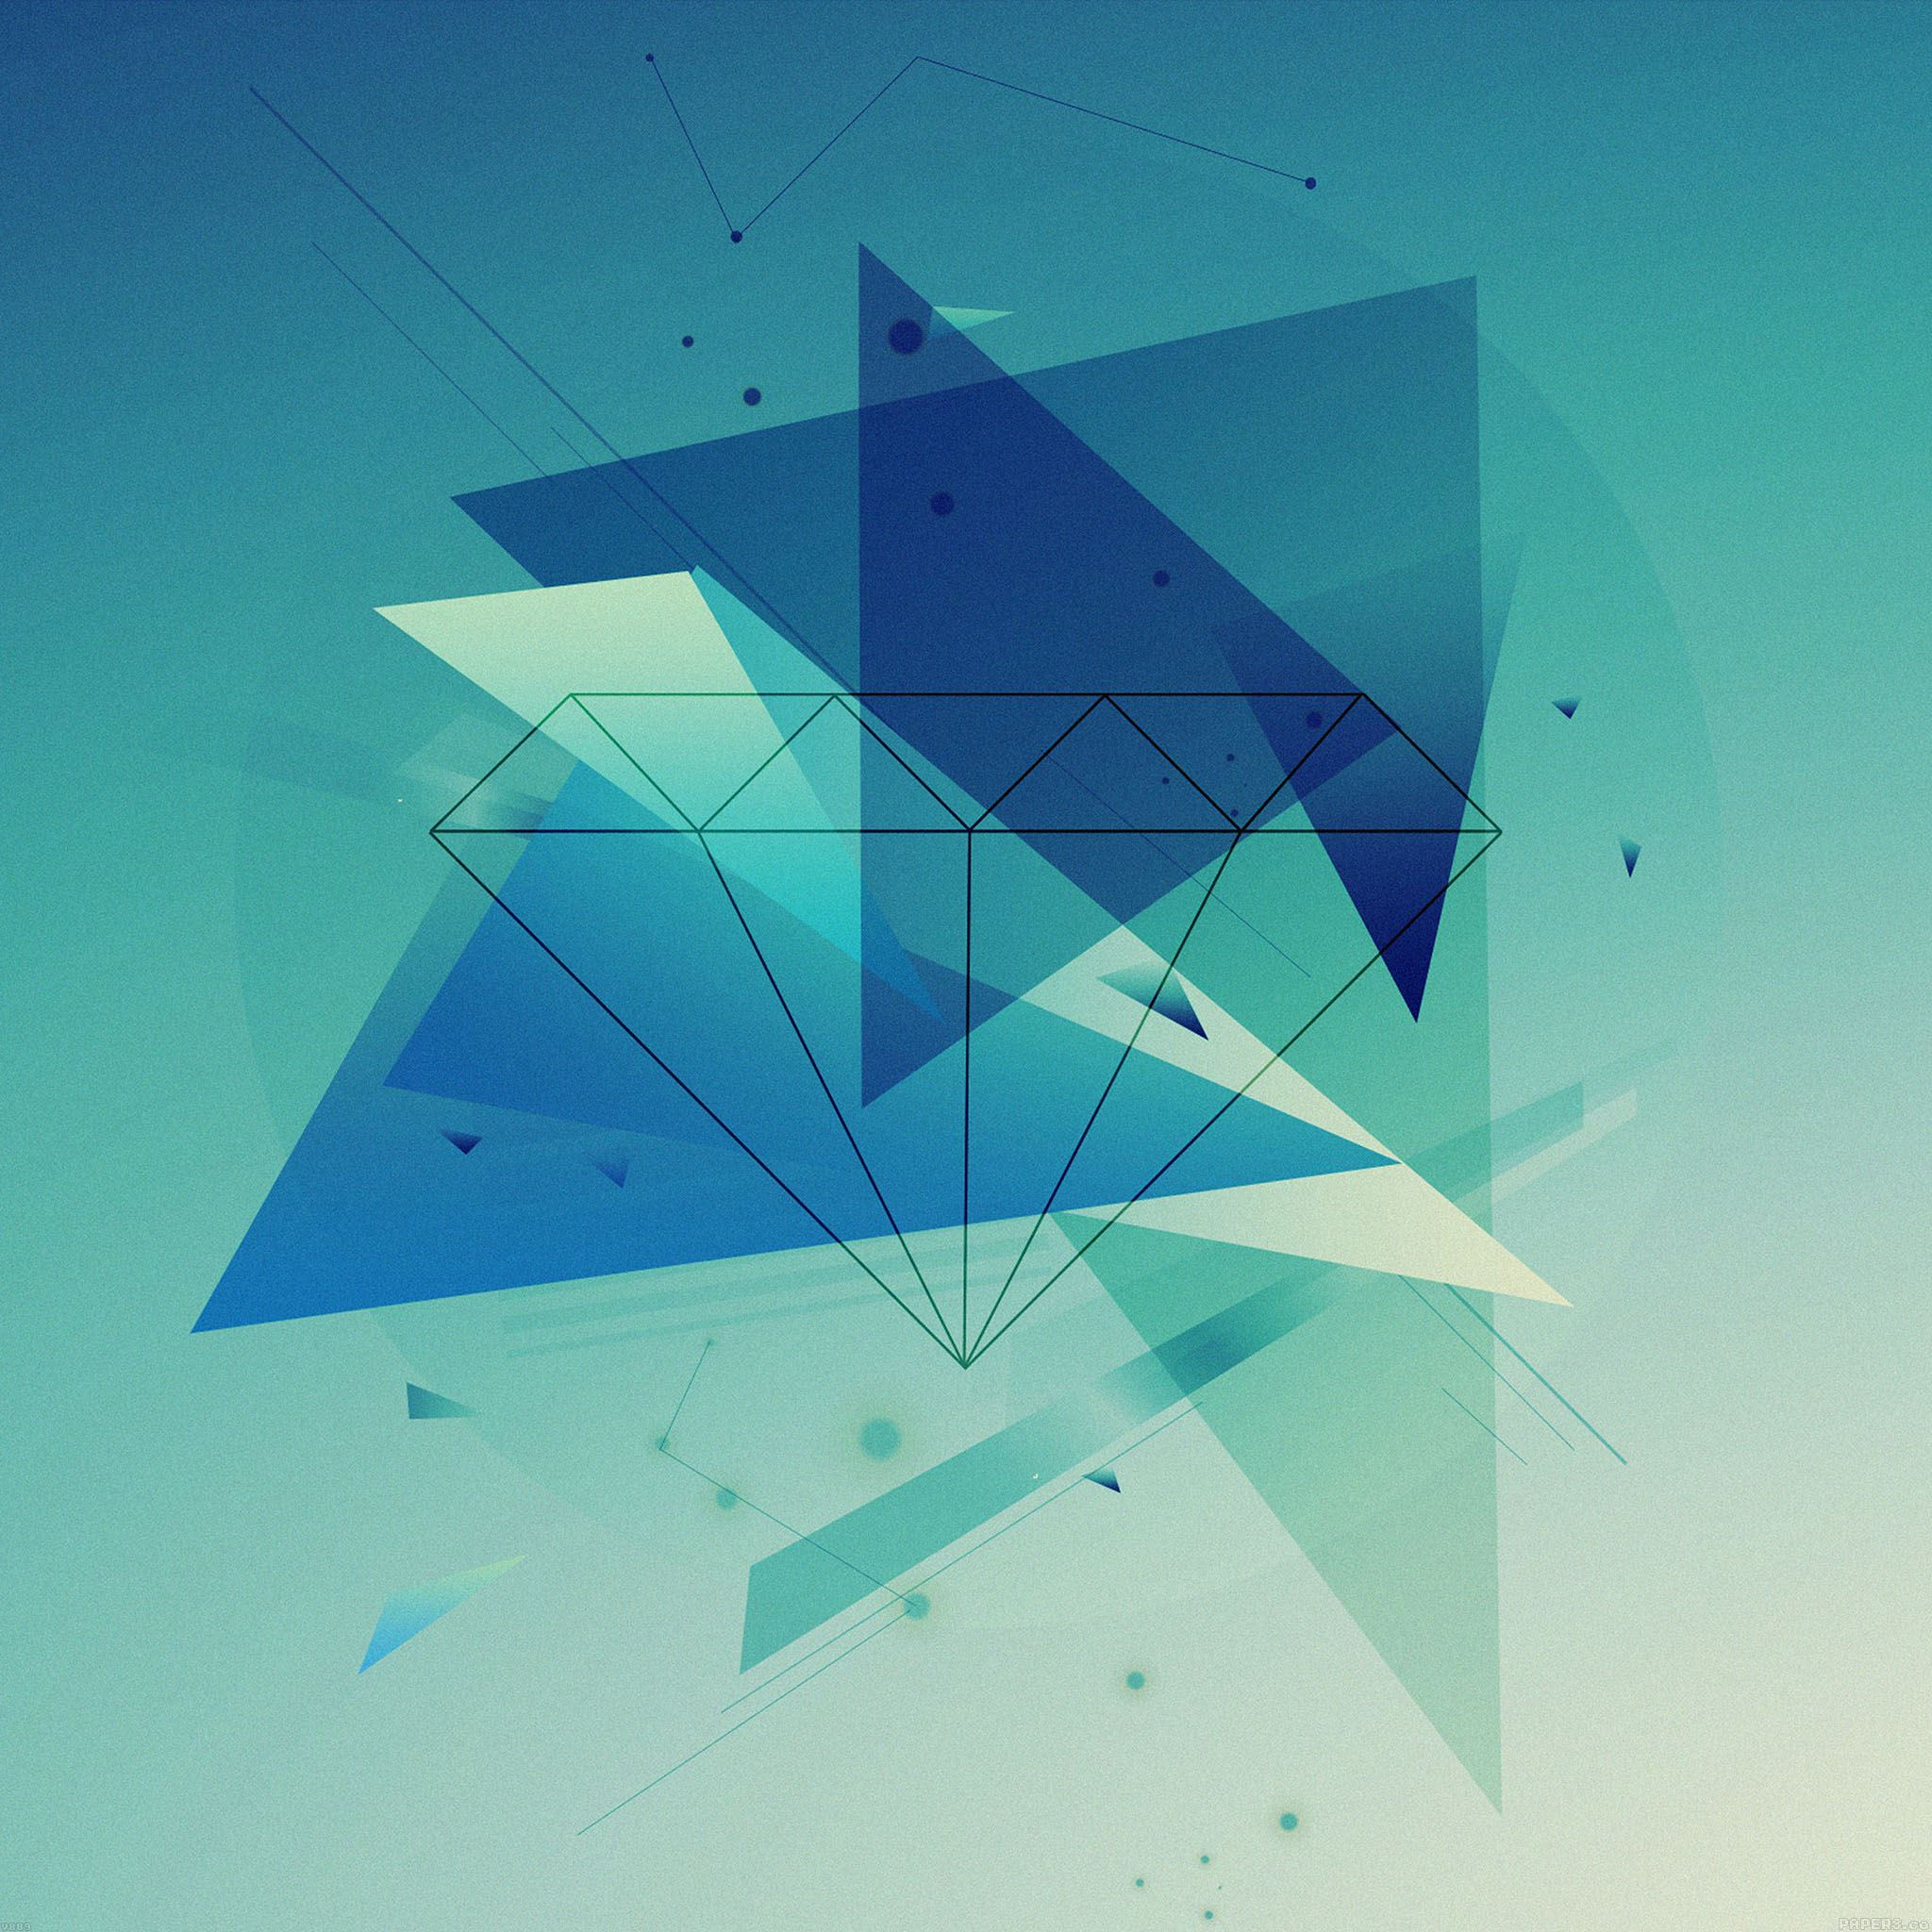 Diamond blue graphic art iPad Air wallpaper